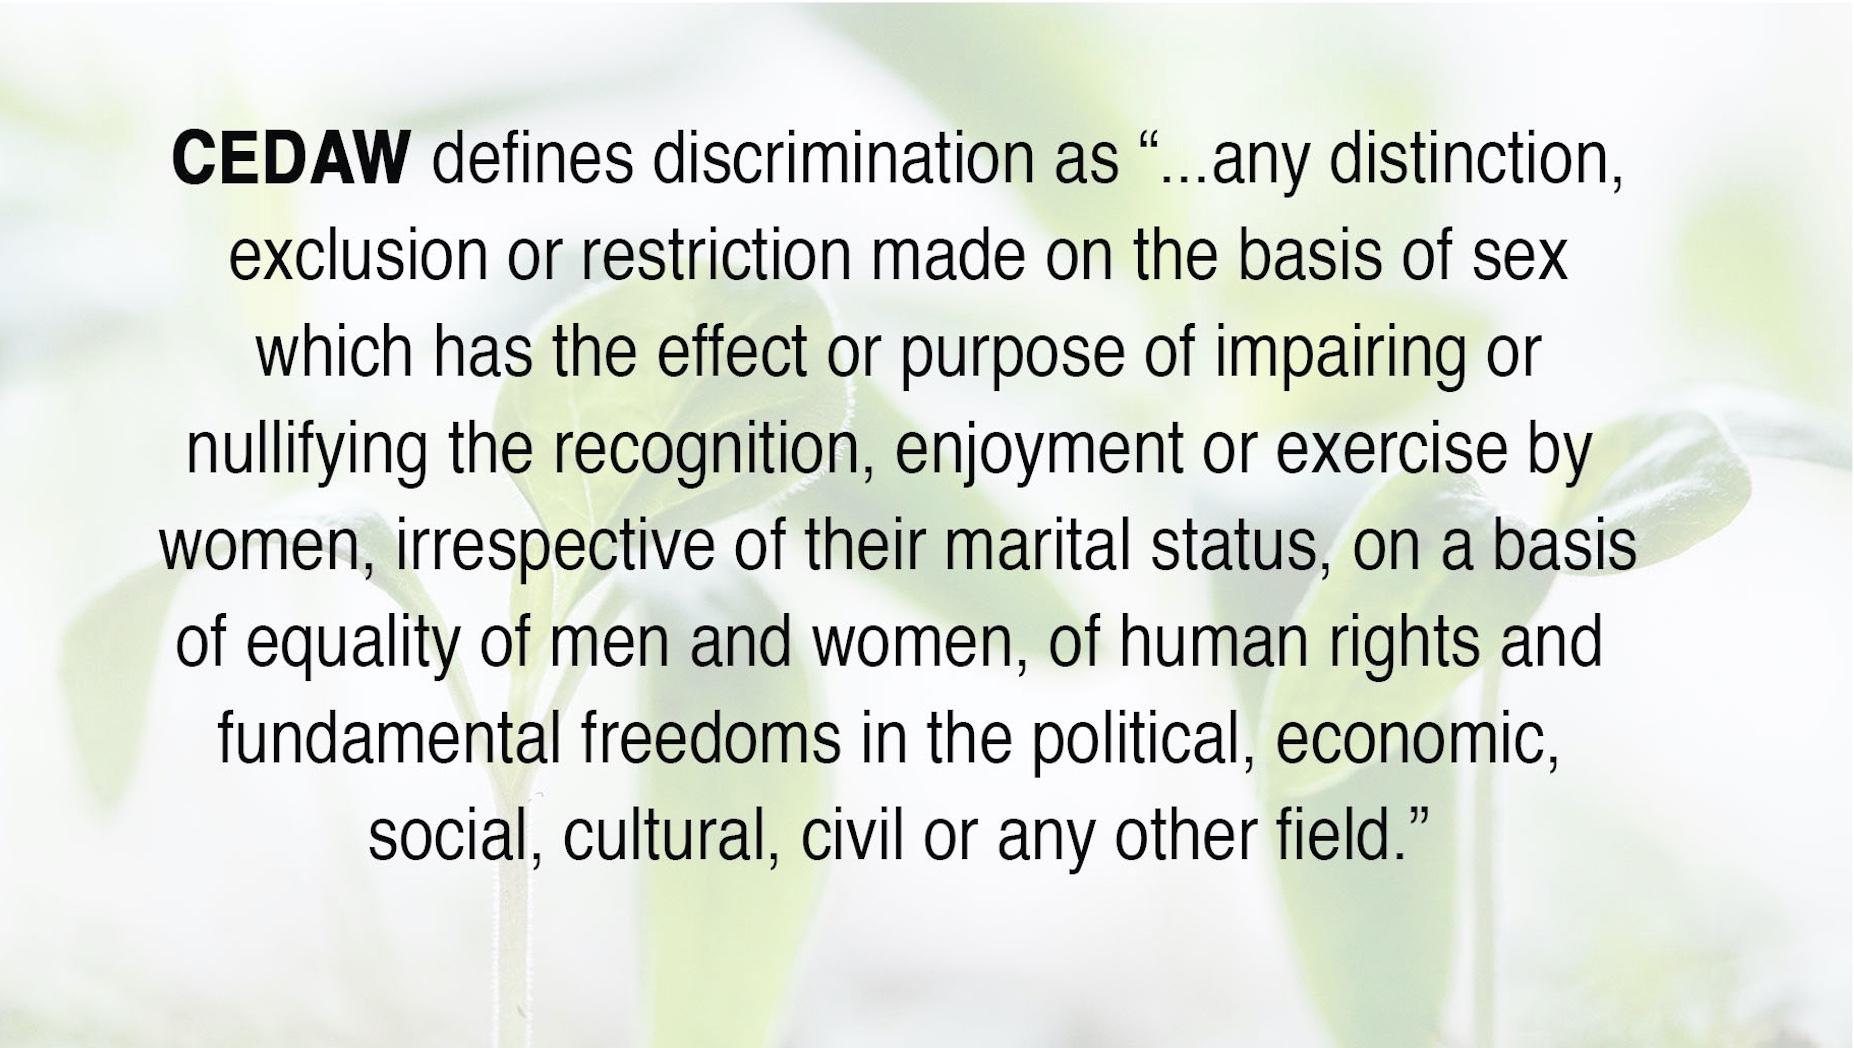 source:http://www.un.org/womenwatch/daw/cedaw/